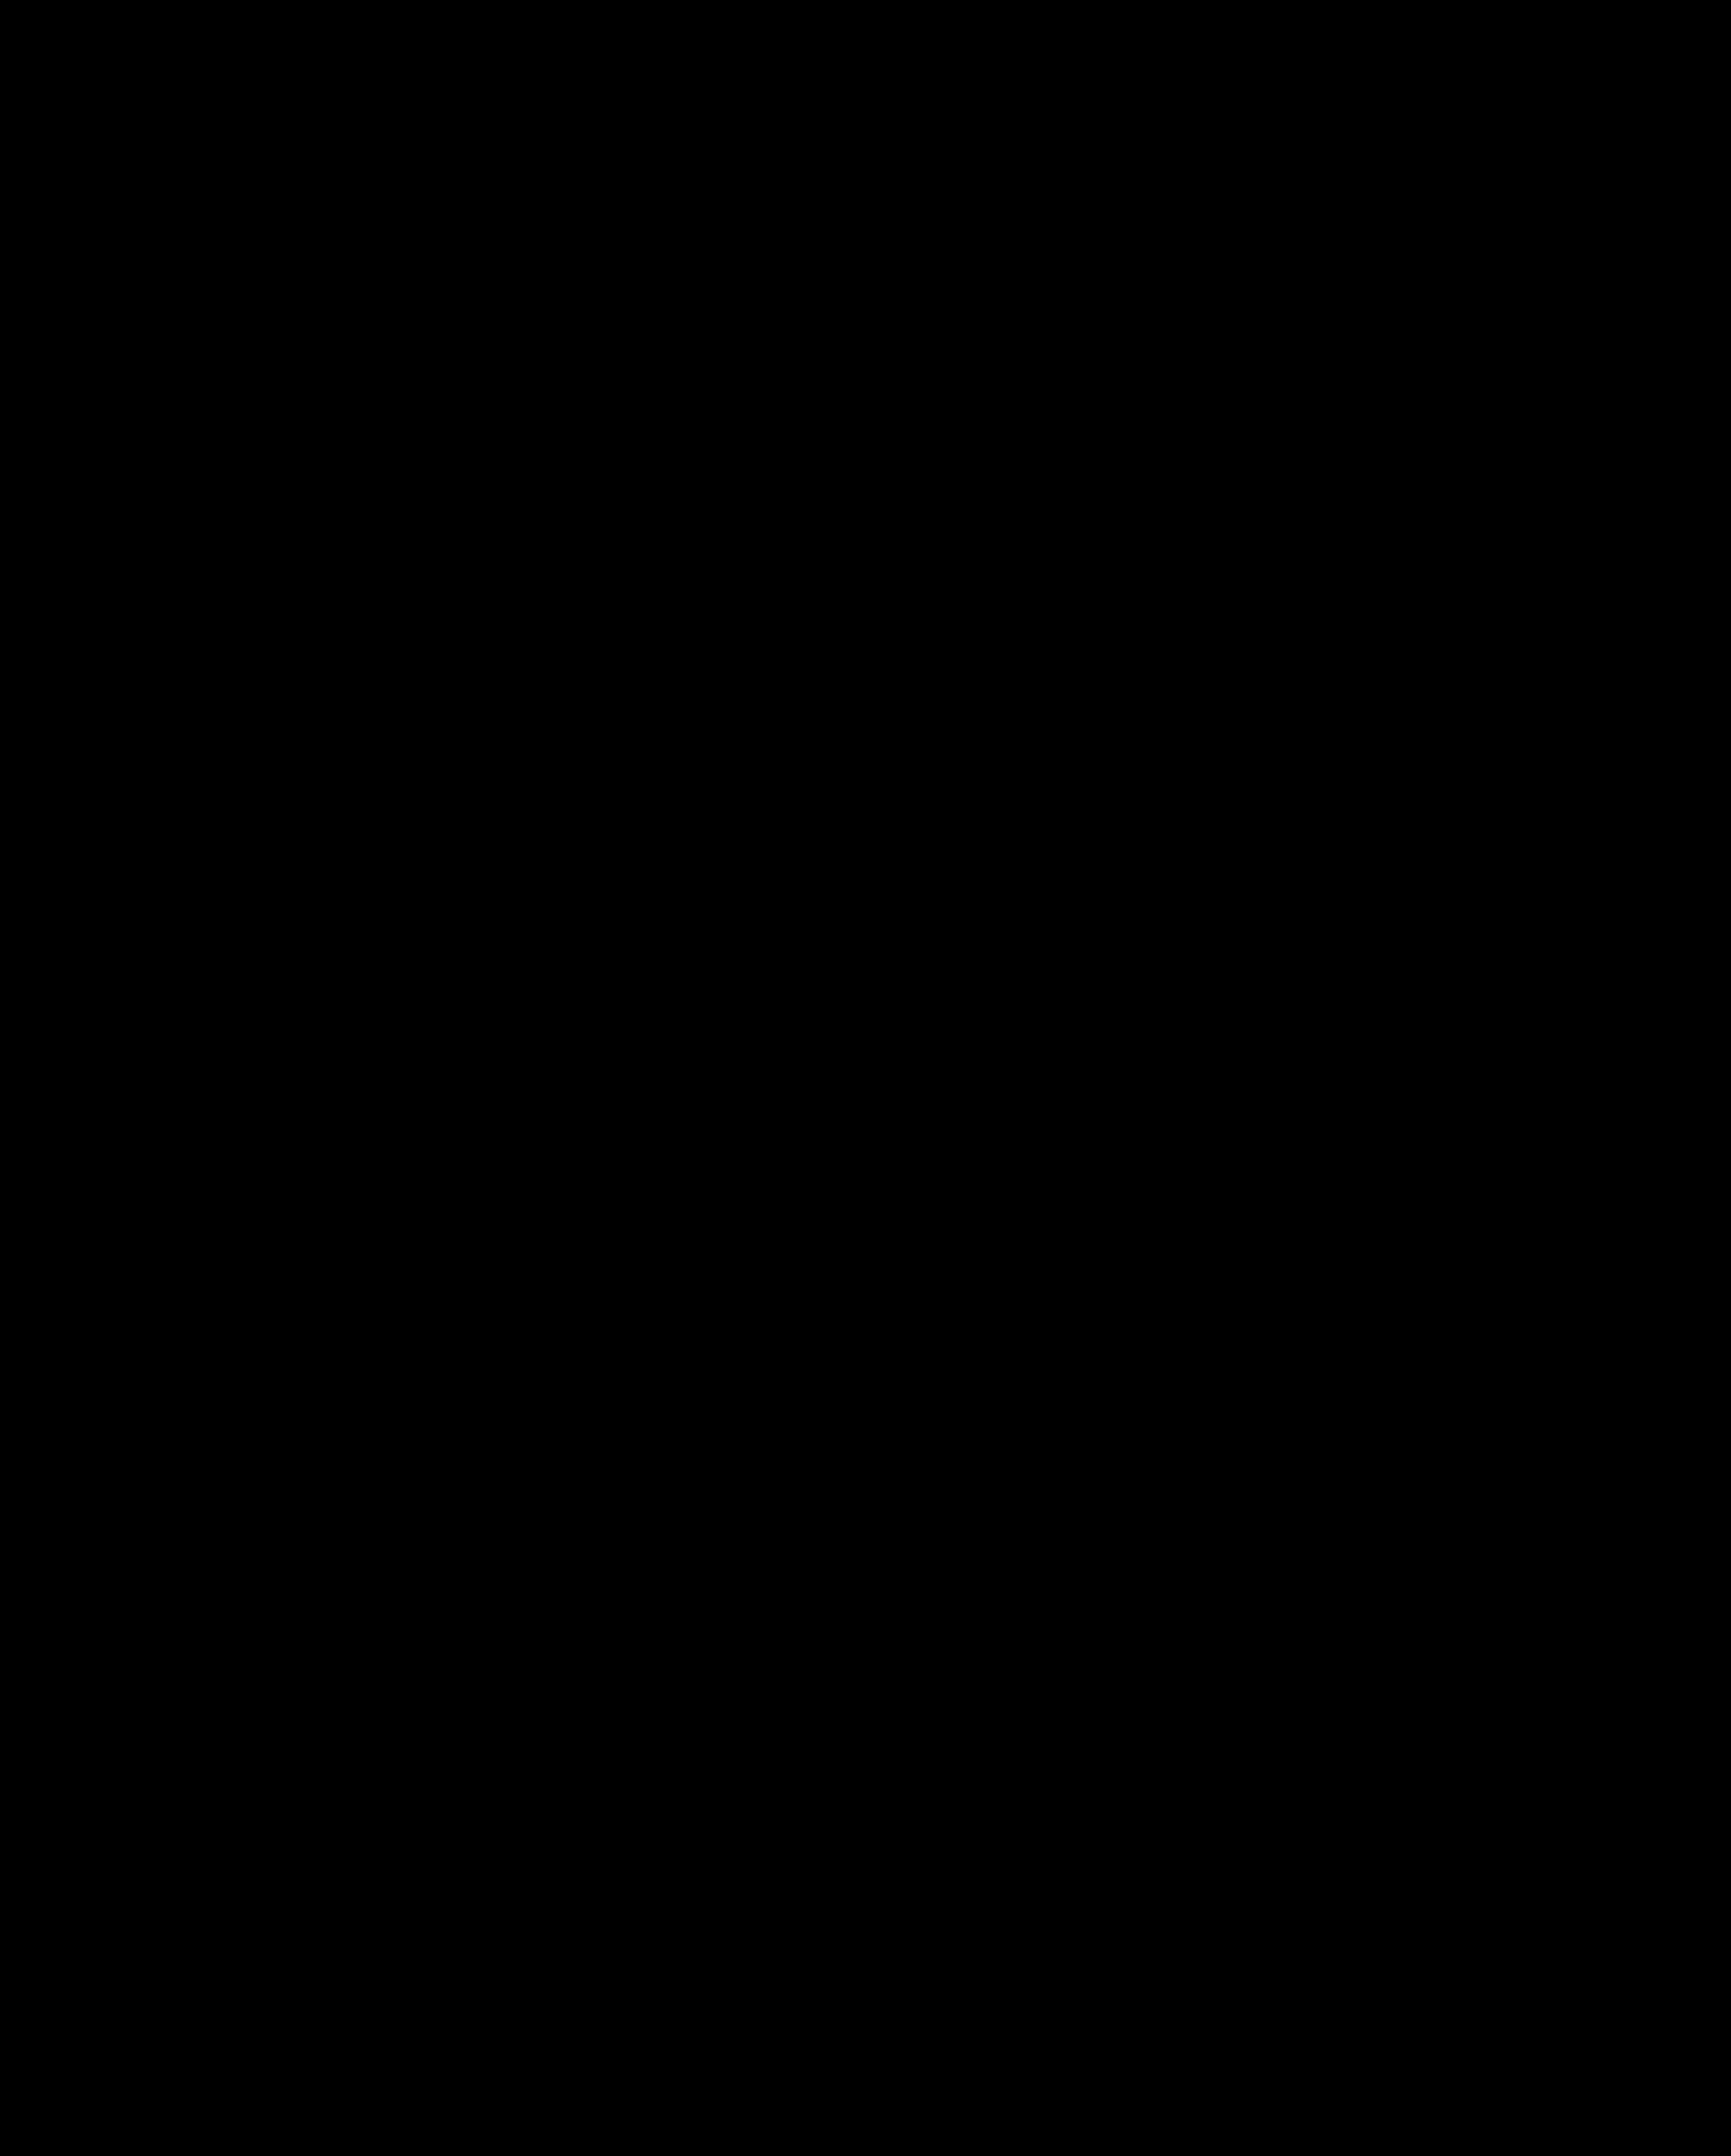 19CCBA5A-B6C1-4ACF-9AD9-04EF0C9C6CFD